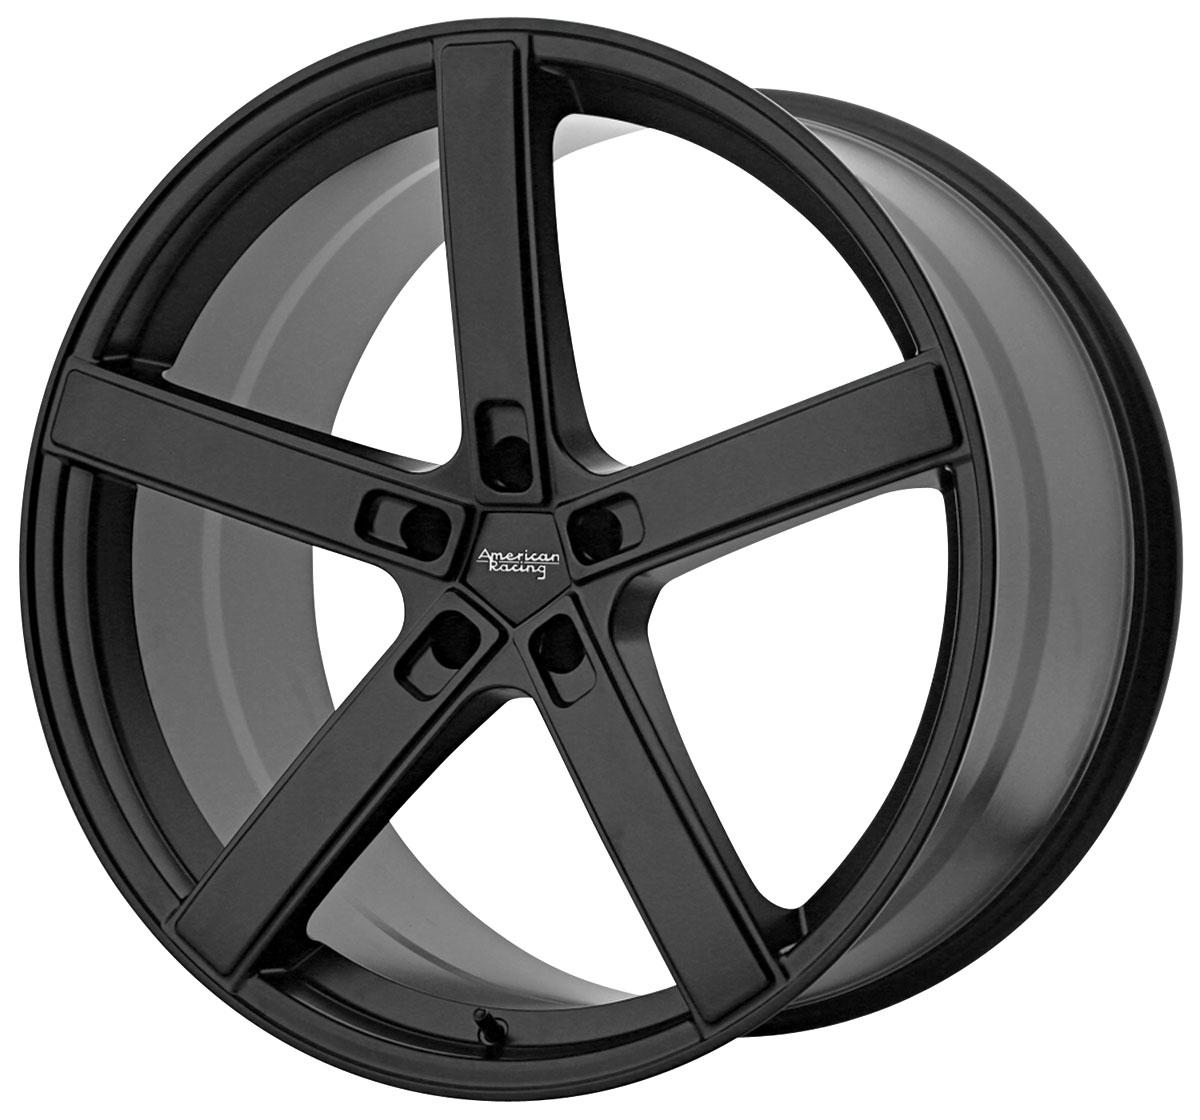 Wheel, American Racing, BLOCKHEAD, 2016-19 CTS/CTS-V, 20x9